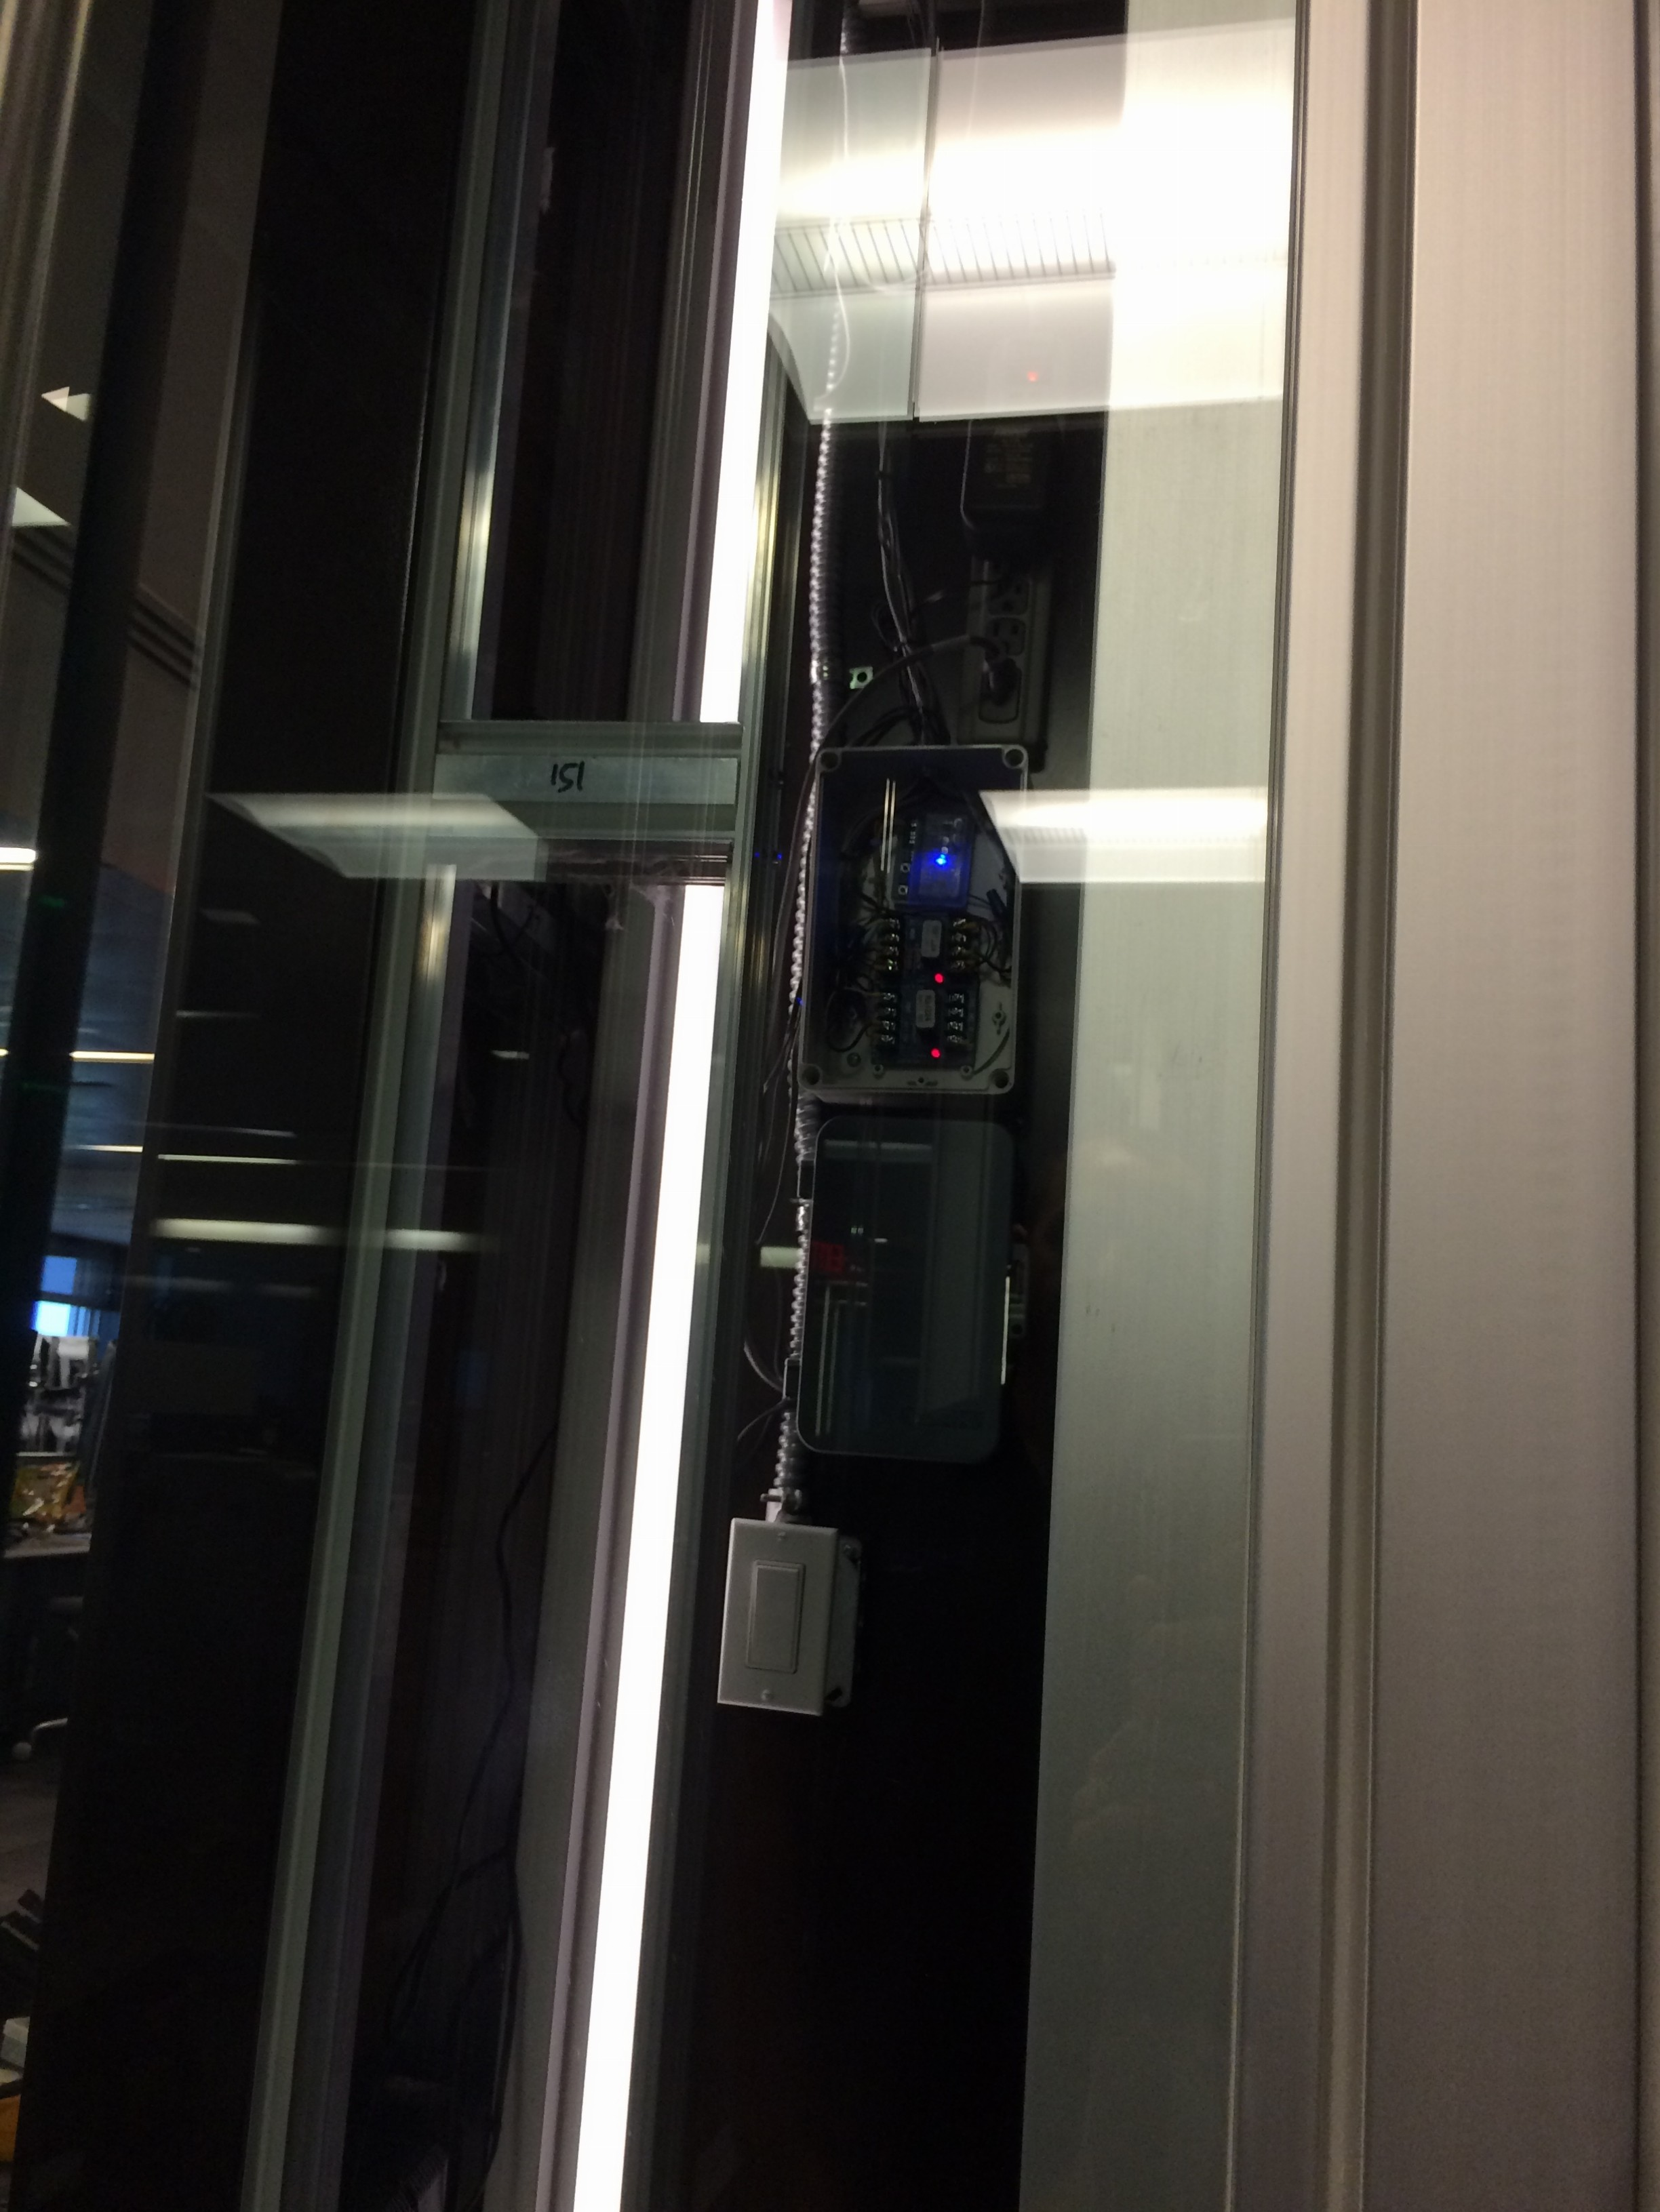 Power / PV-WS2 Wireless Interface